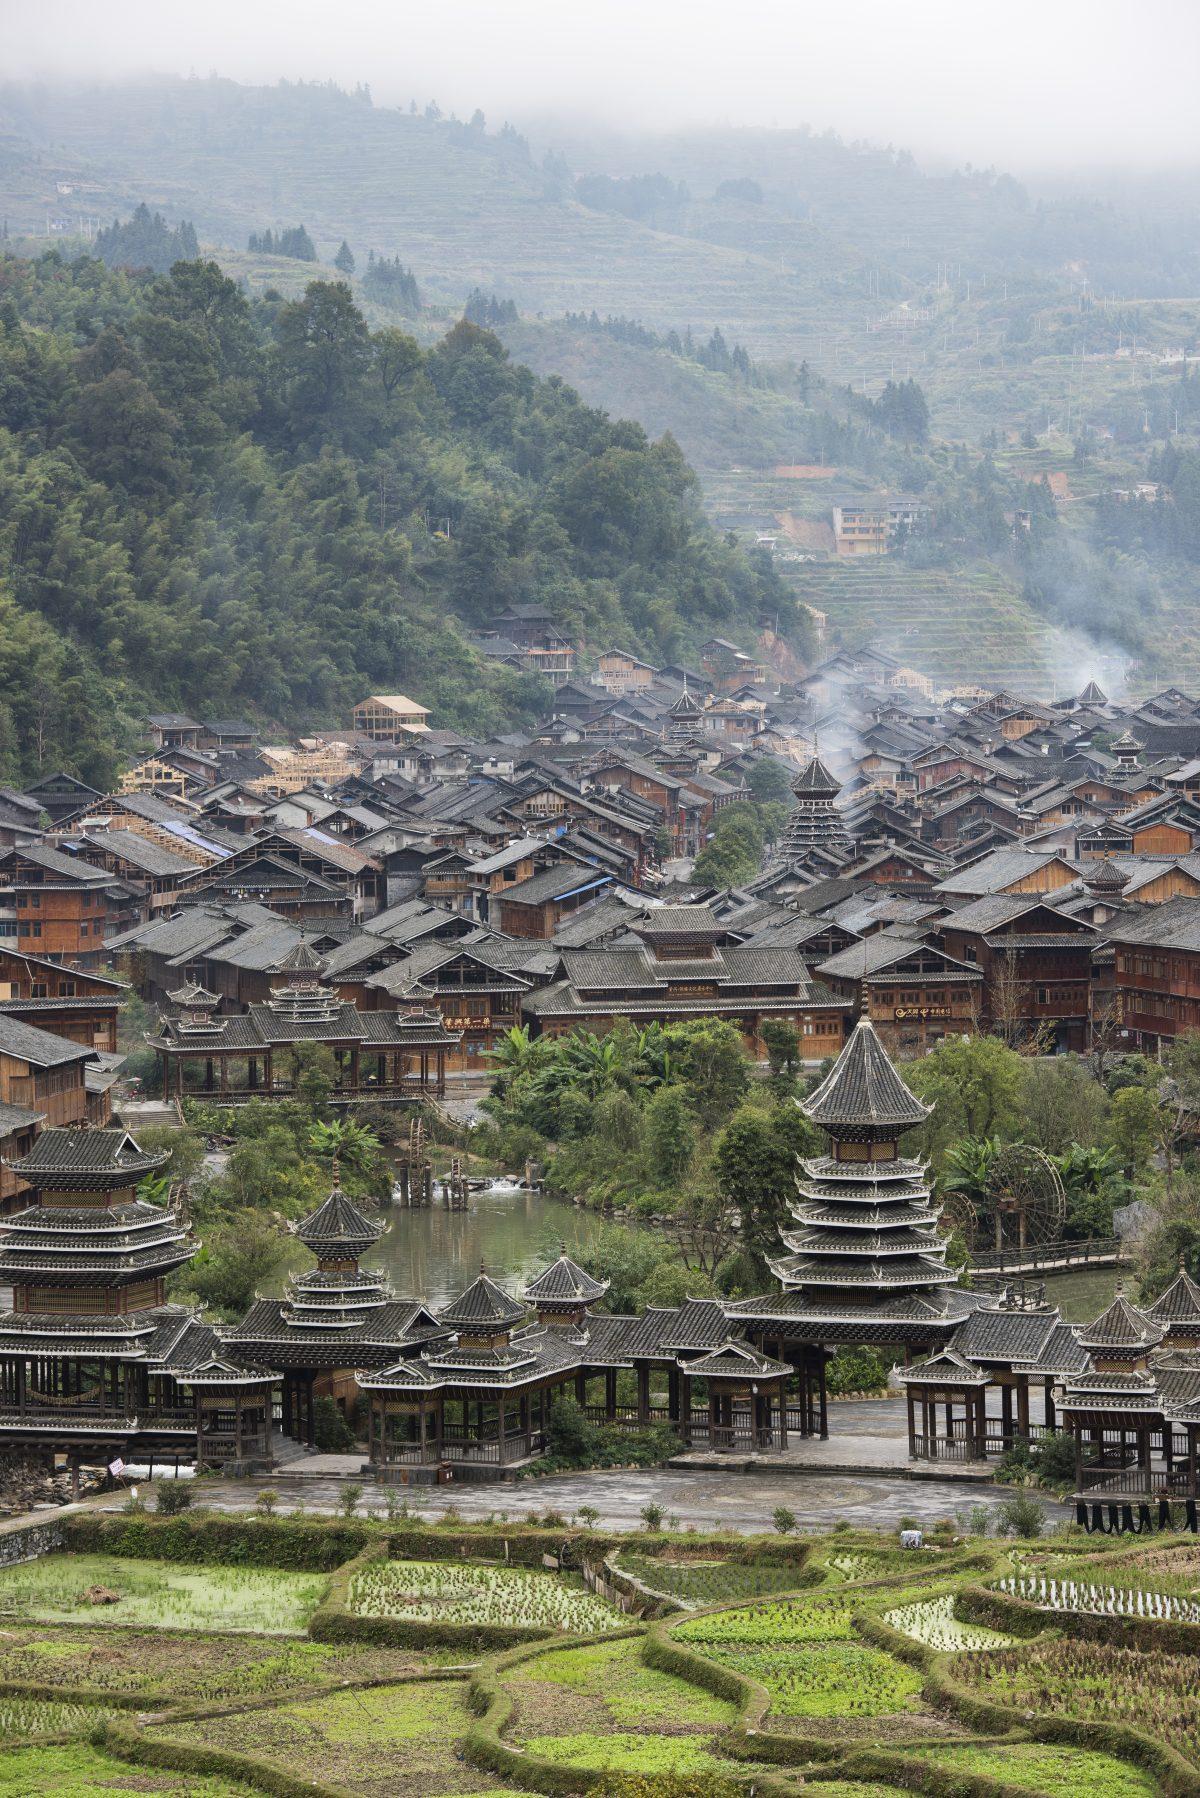 Ethnic Villages